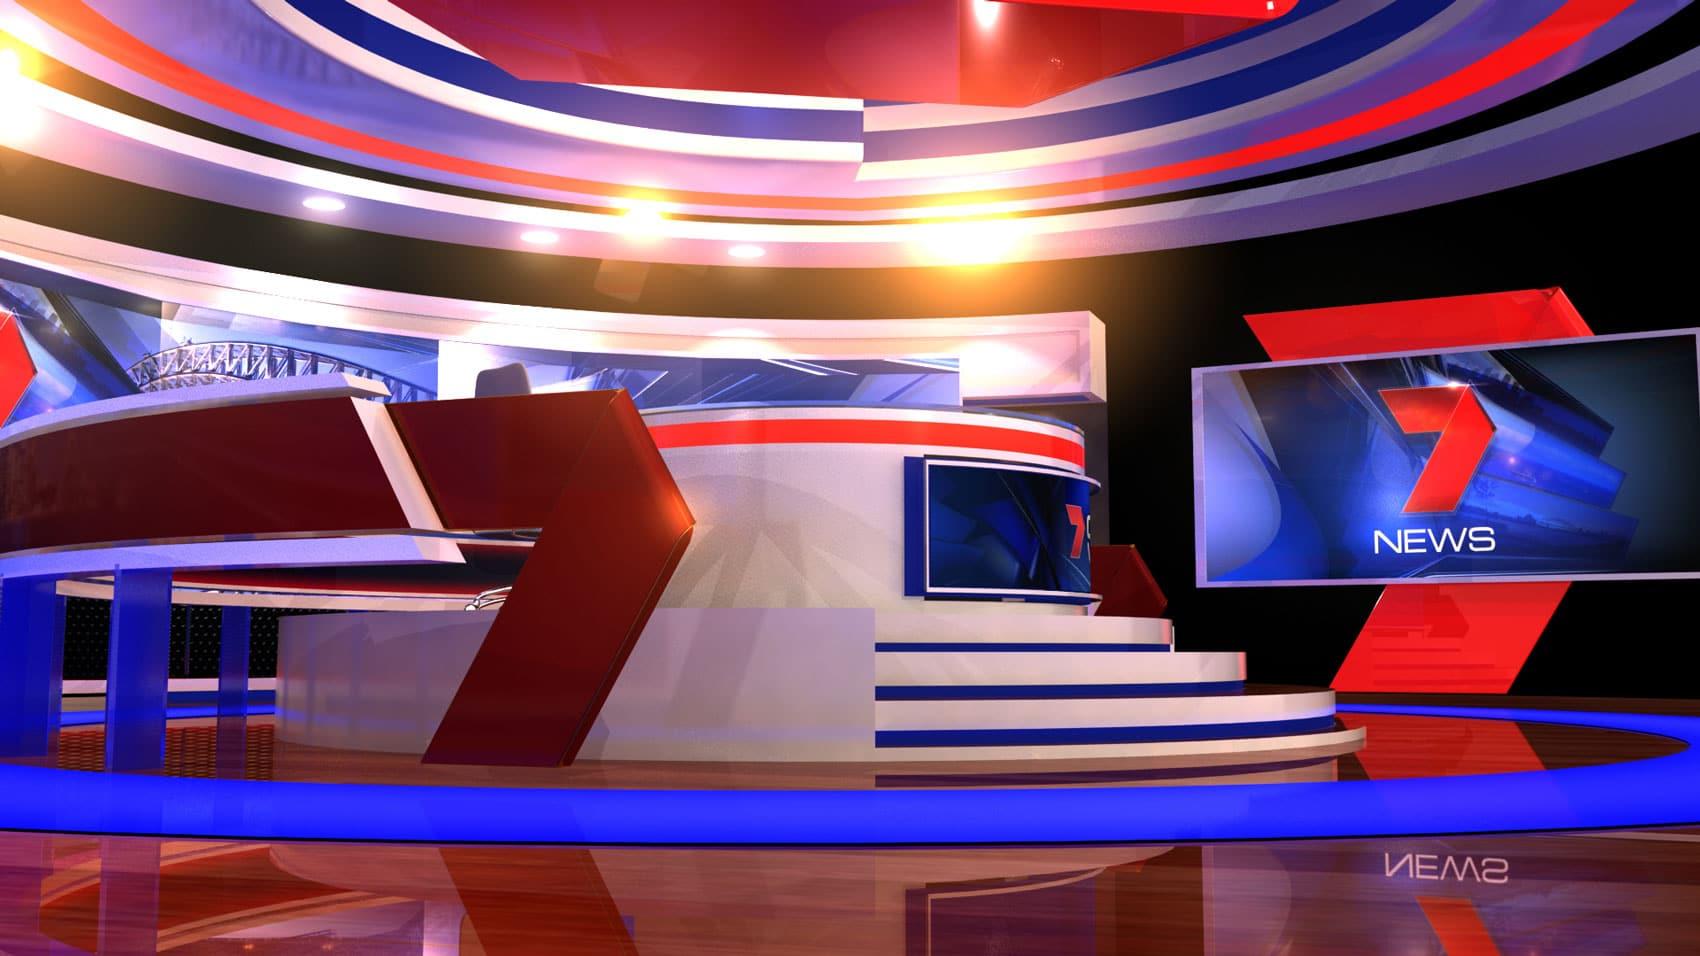 2016 Seven News Set Design 06 Girraphic